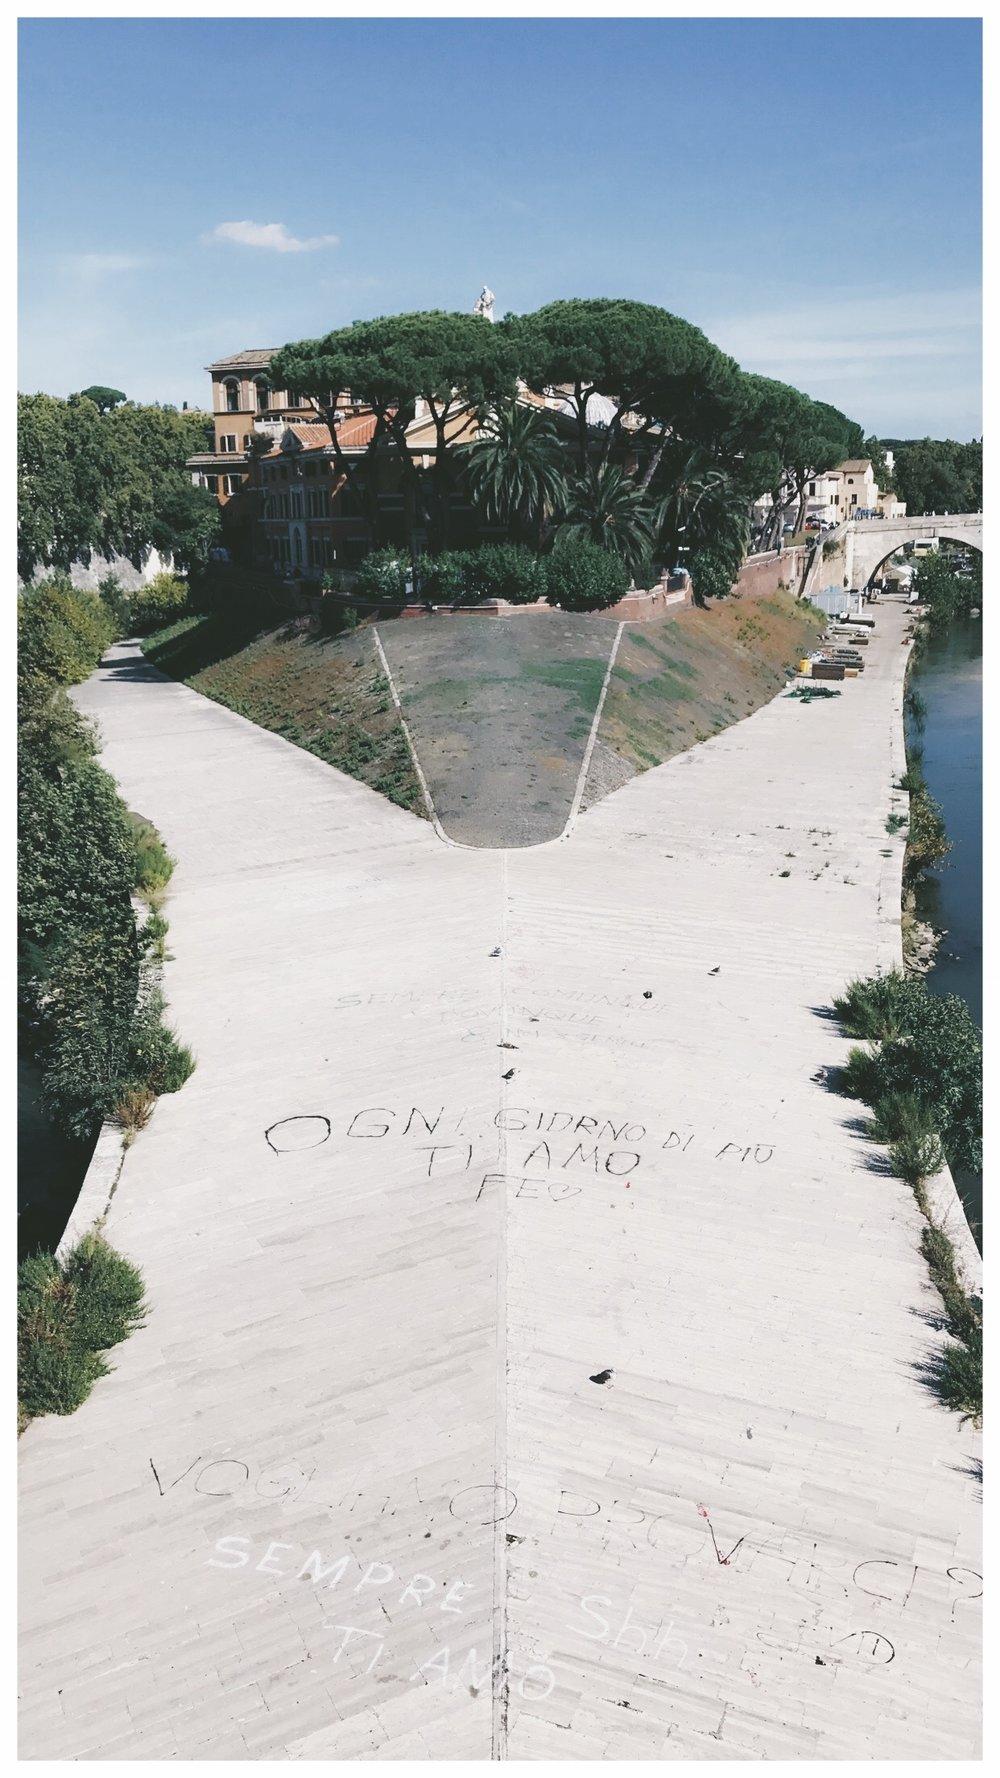 Isola di San Bartolomeo